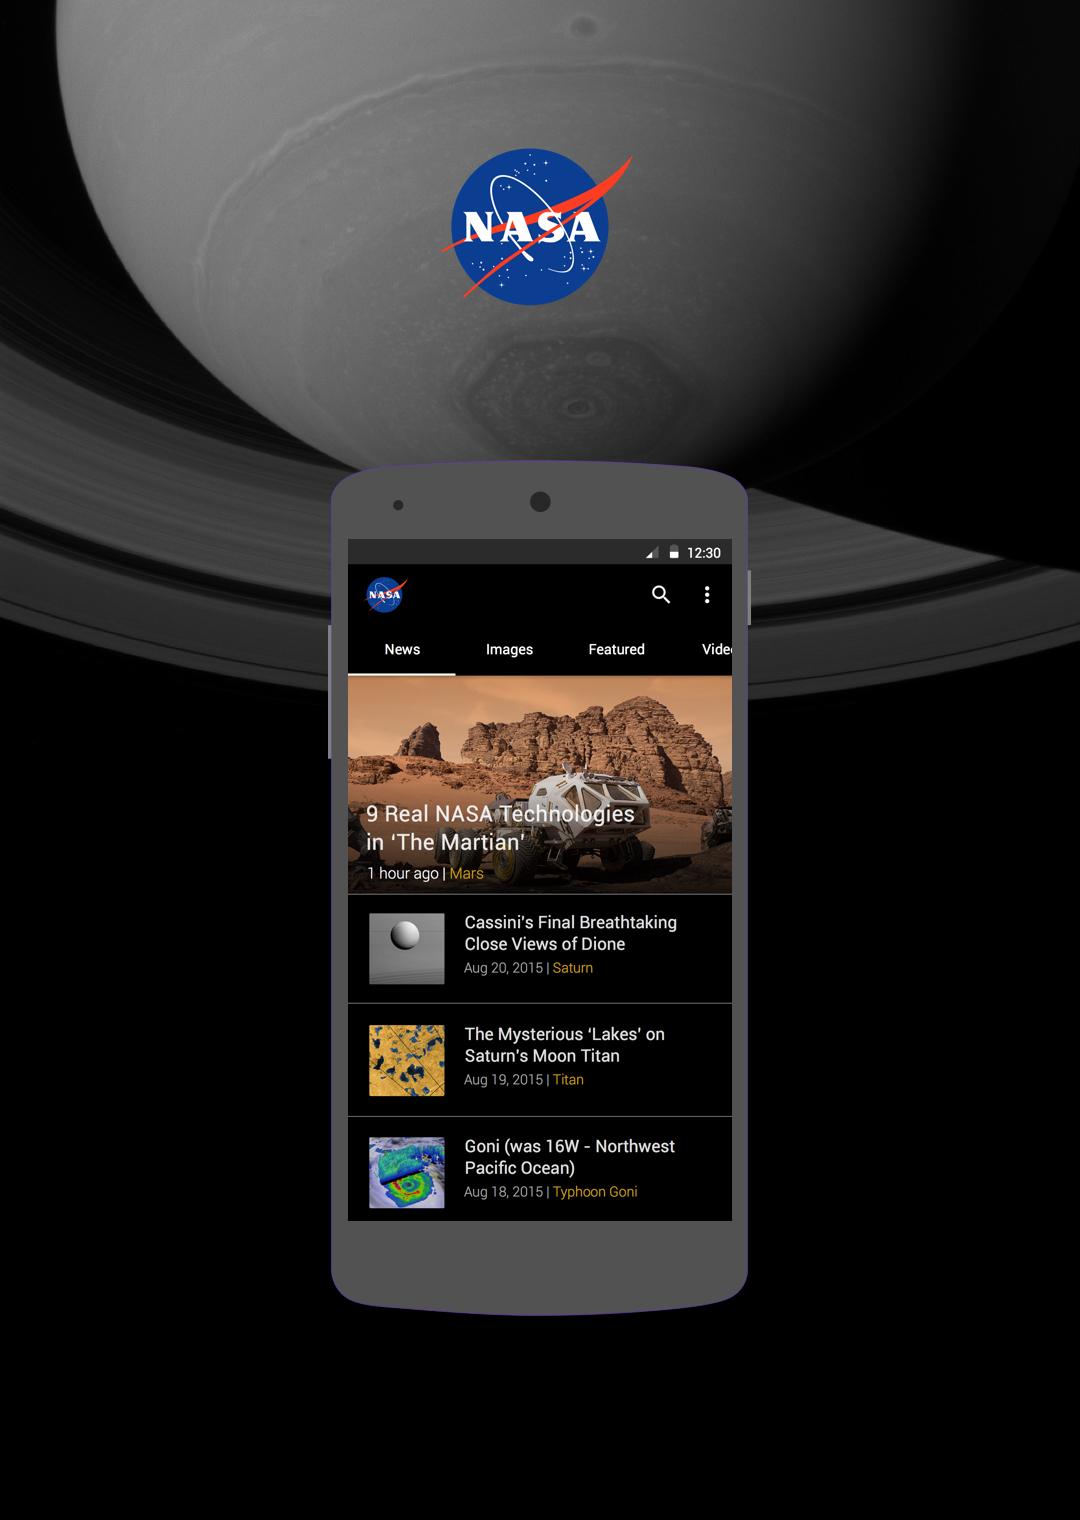 iPhone5c Copy 7.jpg